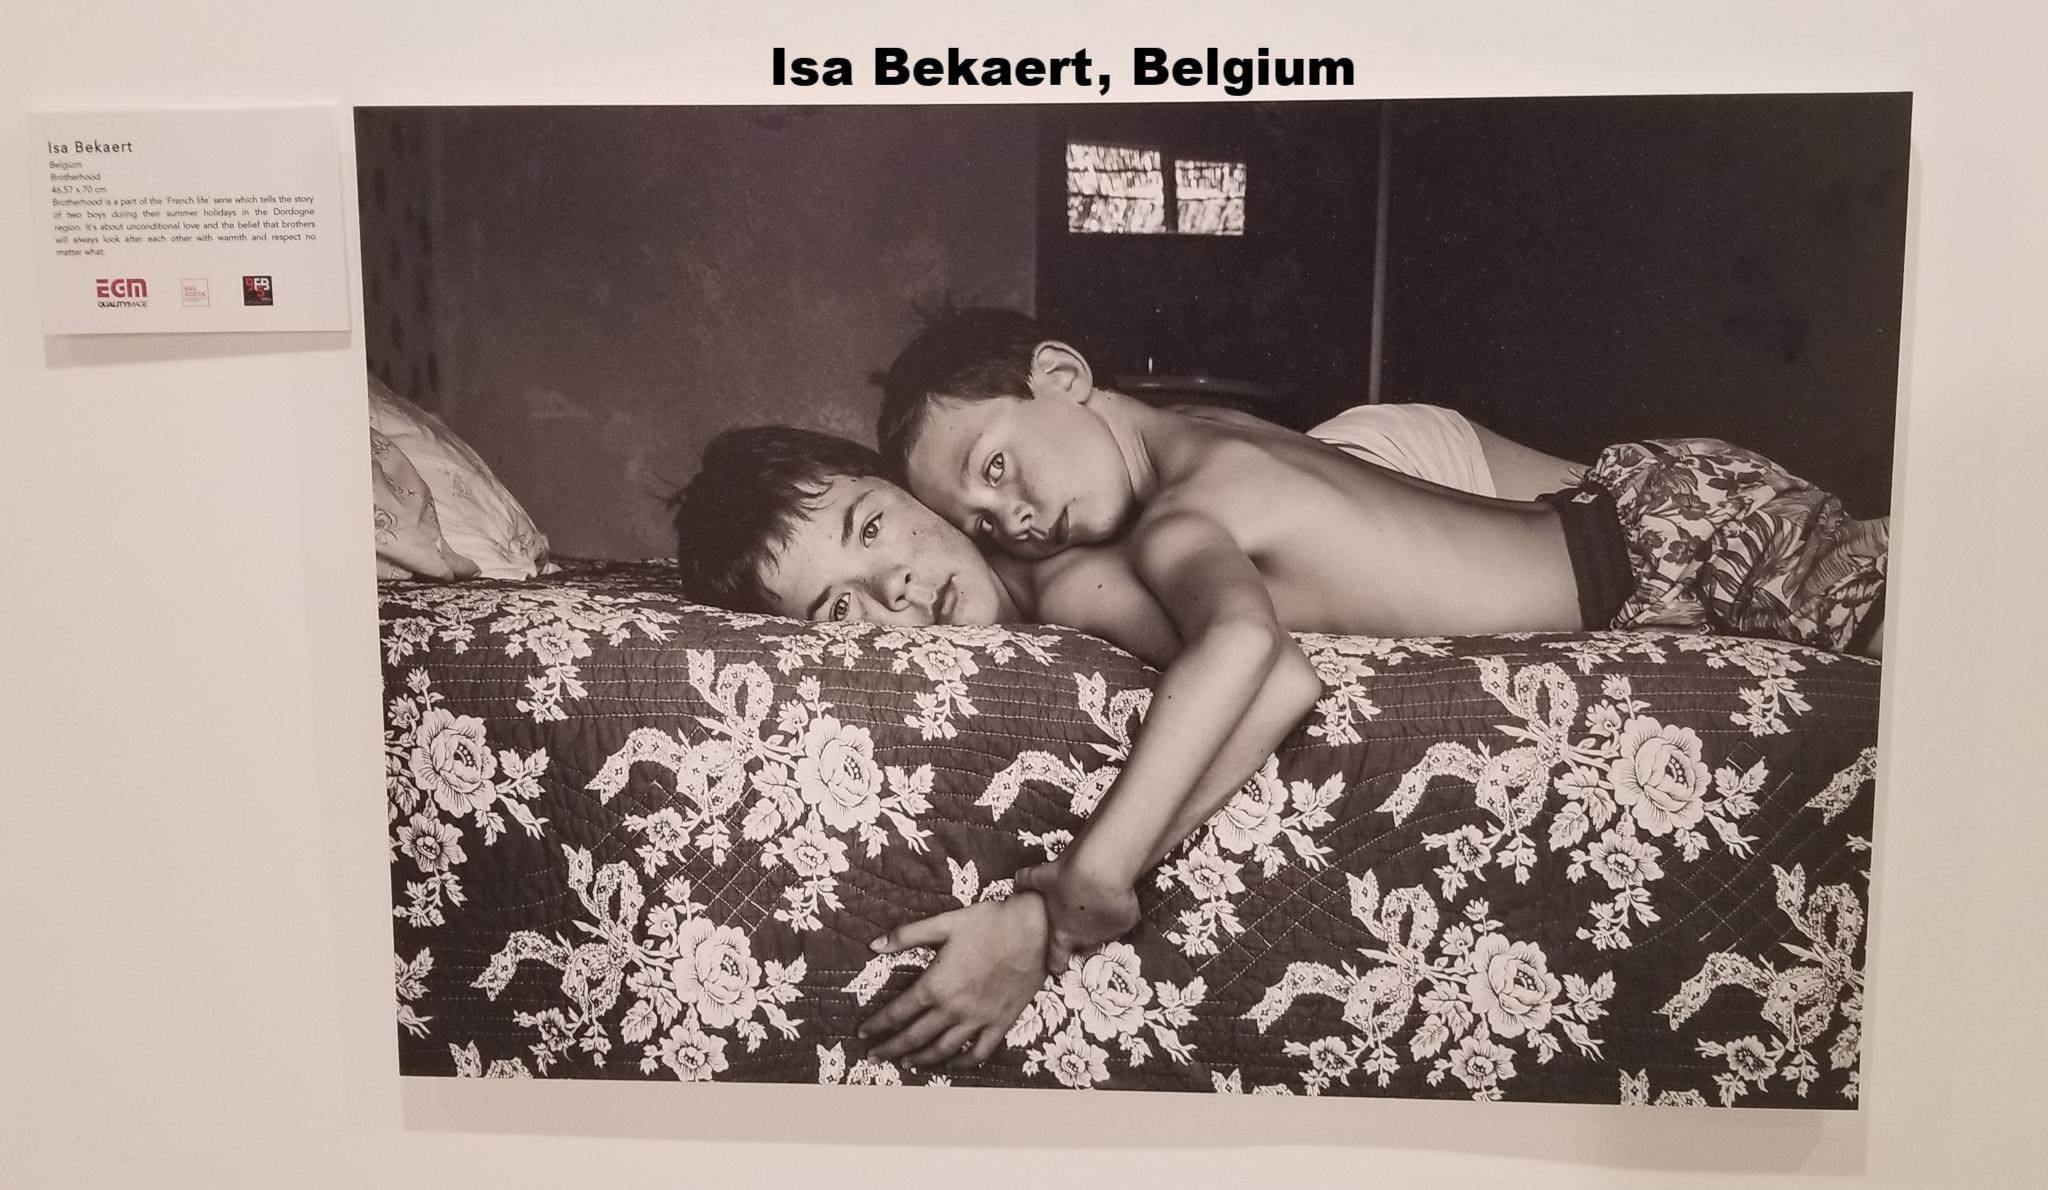 Isa Bekaert, Belgium